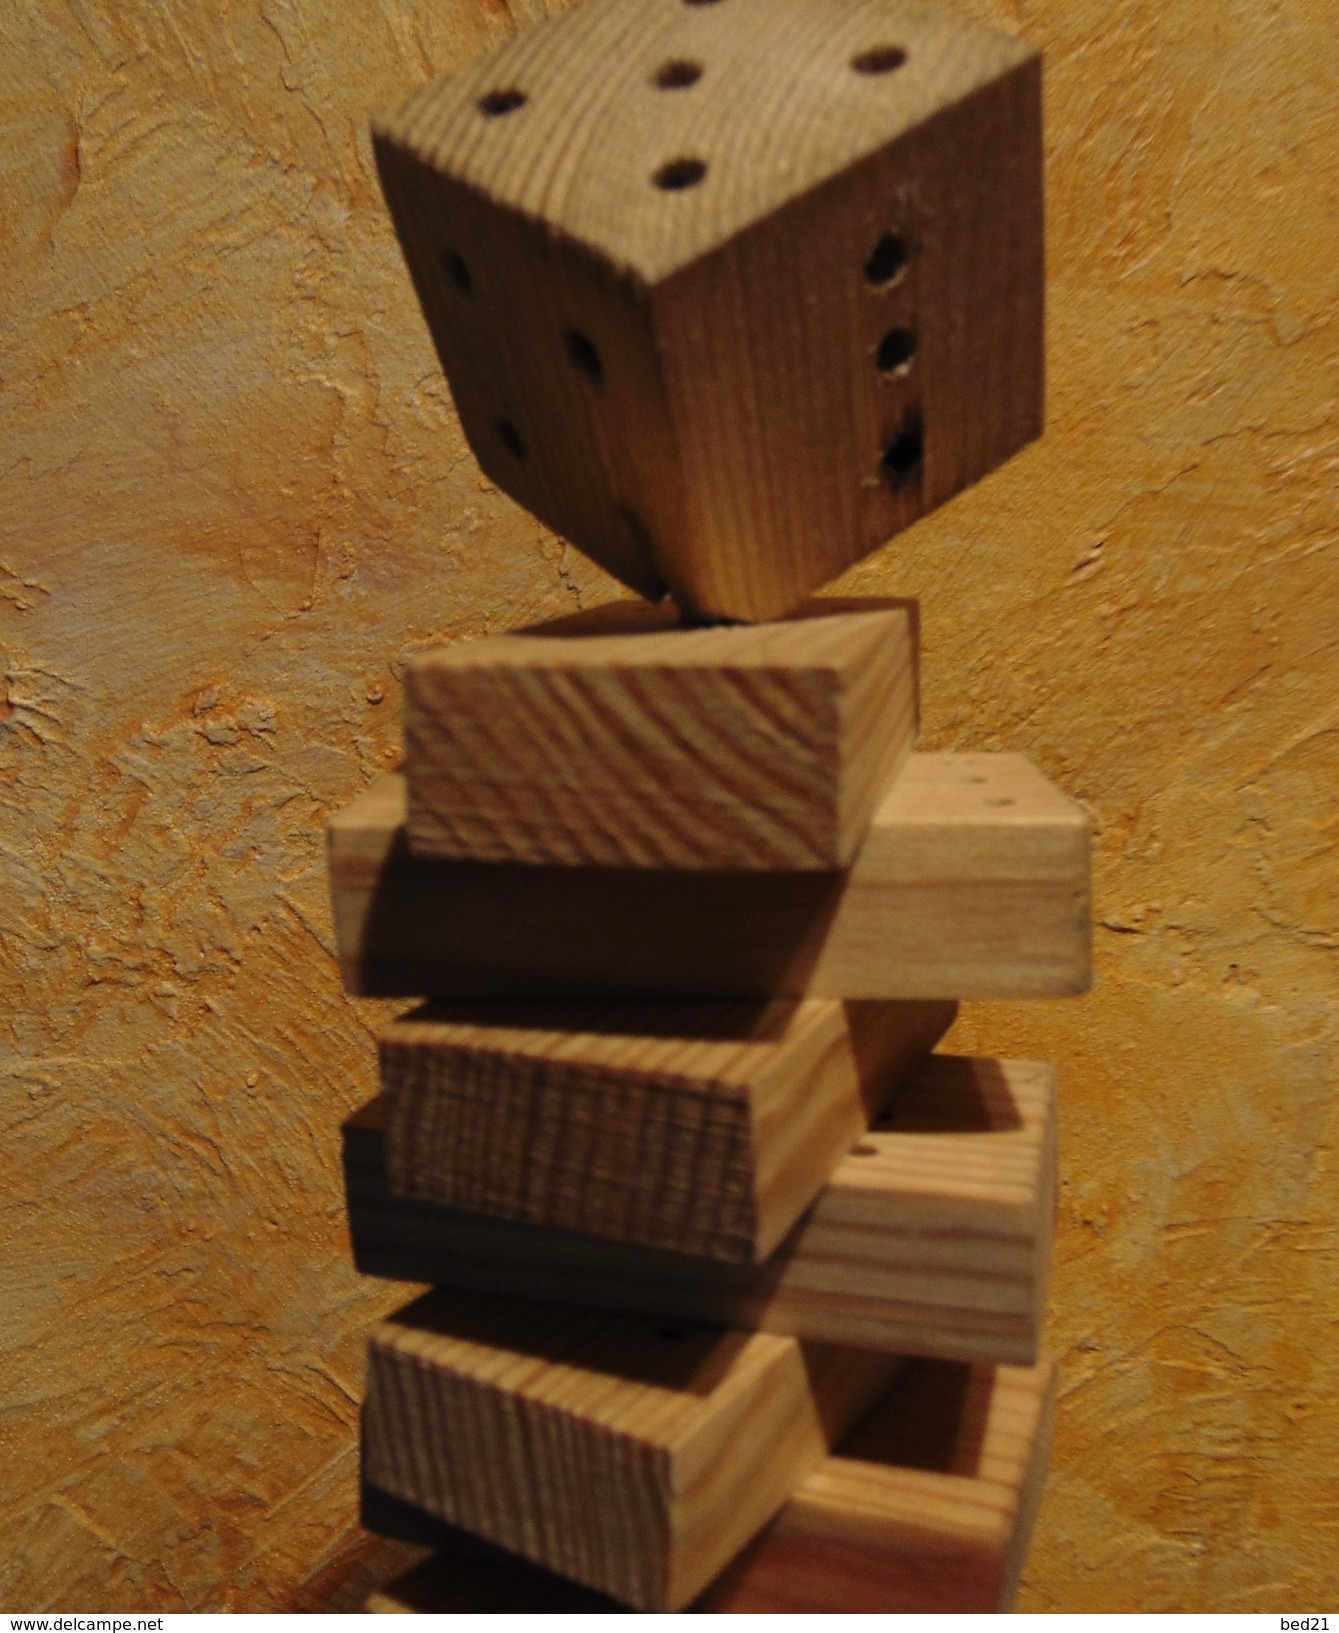 group games parlour games jeu de domino ancien et original. Black Bedroom Furniture Sets. Home Design Ideas